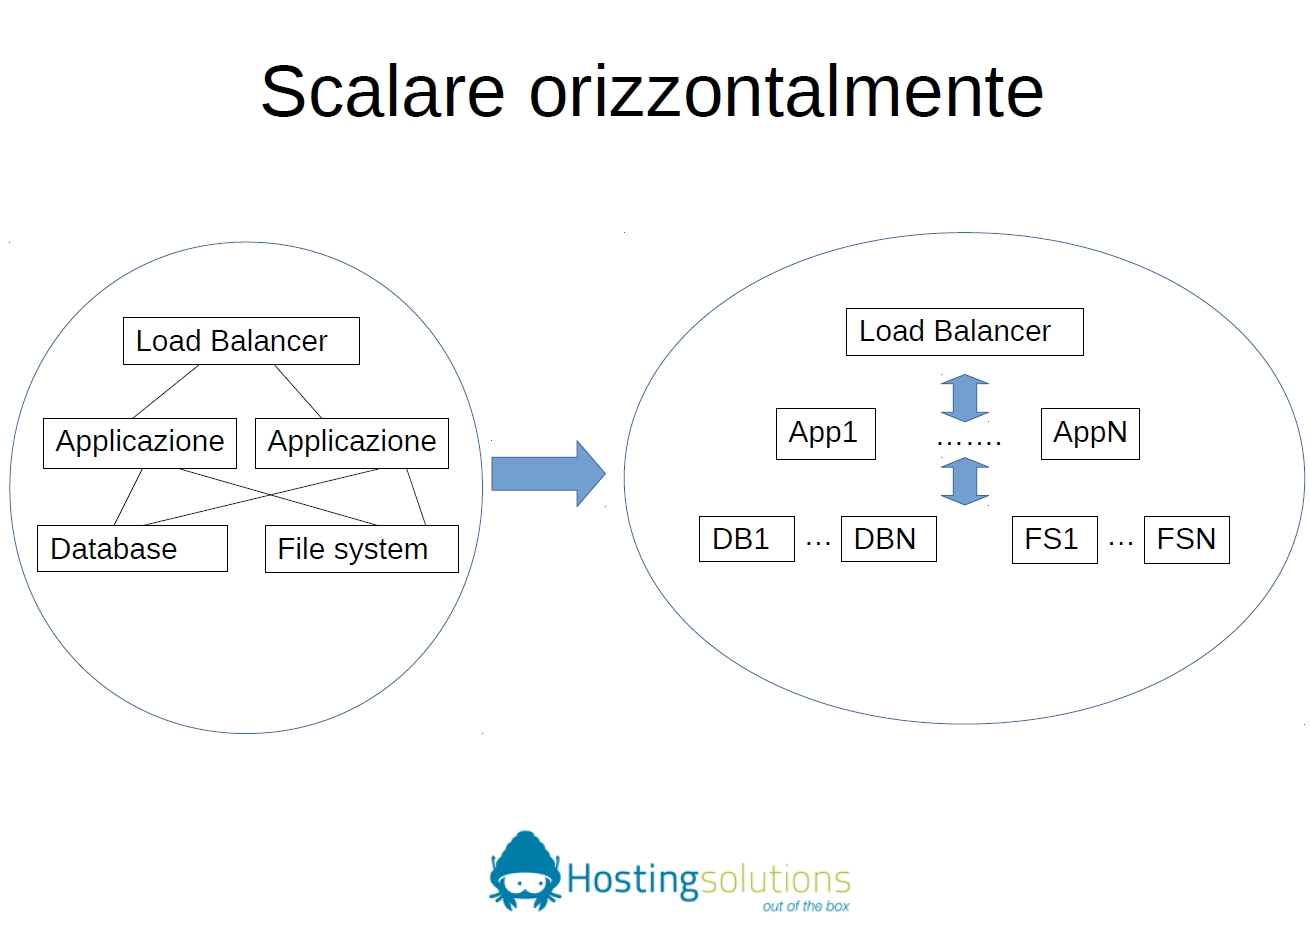 Speech scalabilità orizzontale